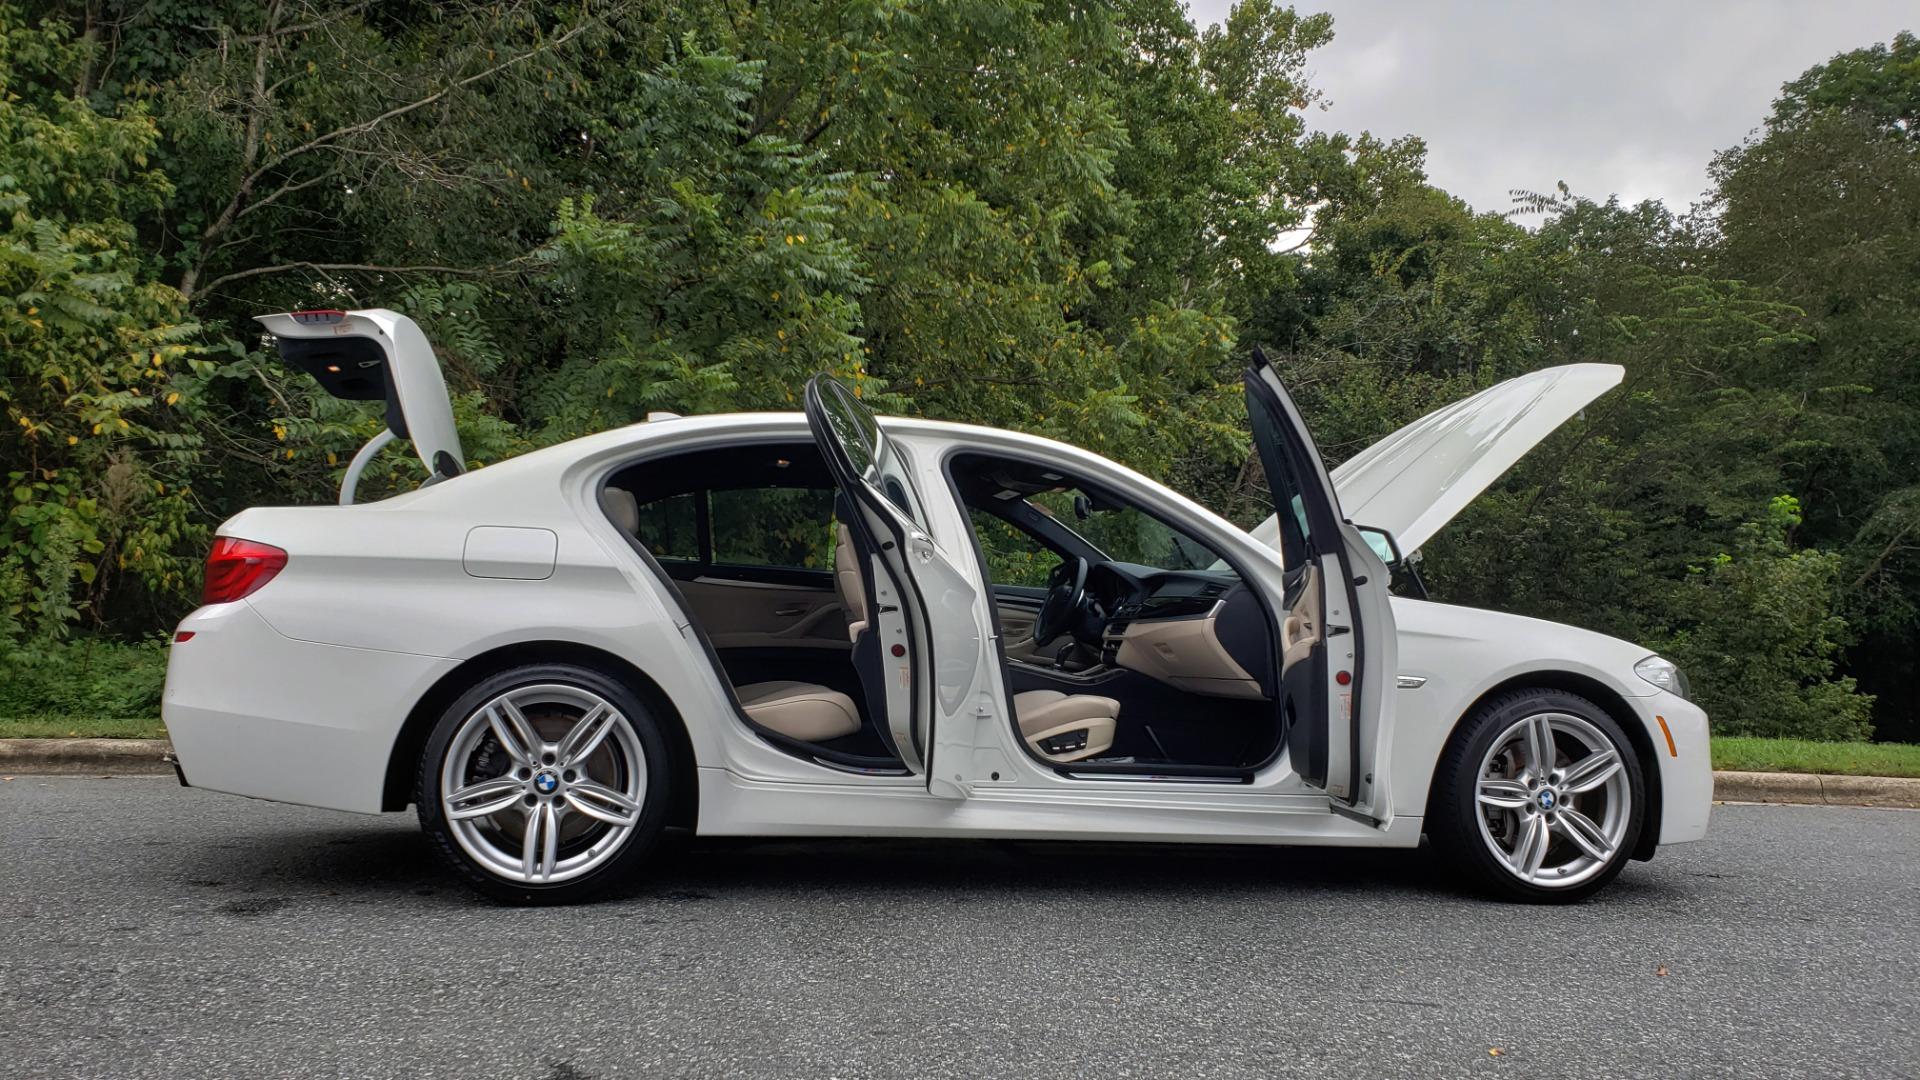 Used 2012 BMW 5 SERIES 550I M SPORT / NAV / CONV PKG / SUNROOF / PREM SND / REARVIEW for sale Sold at Formula Imports in Charlotte NC 28227 12